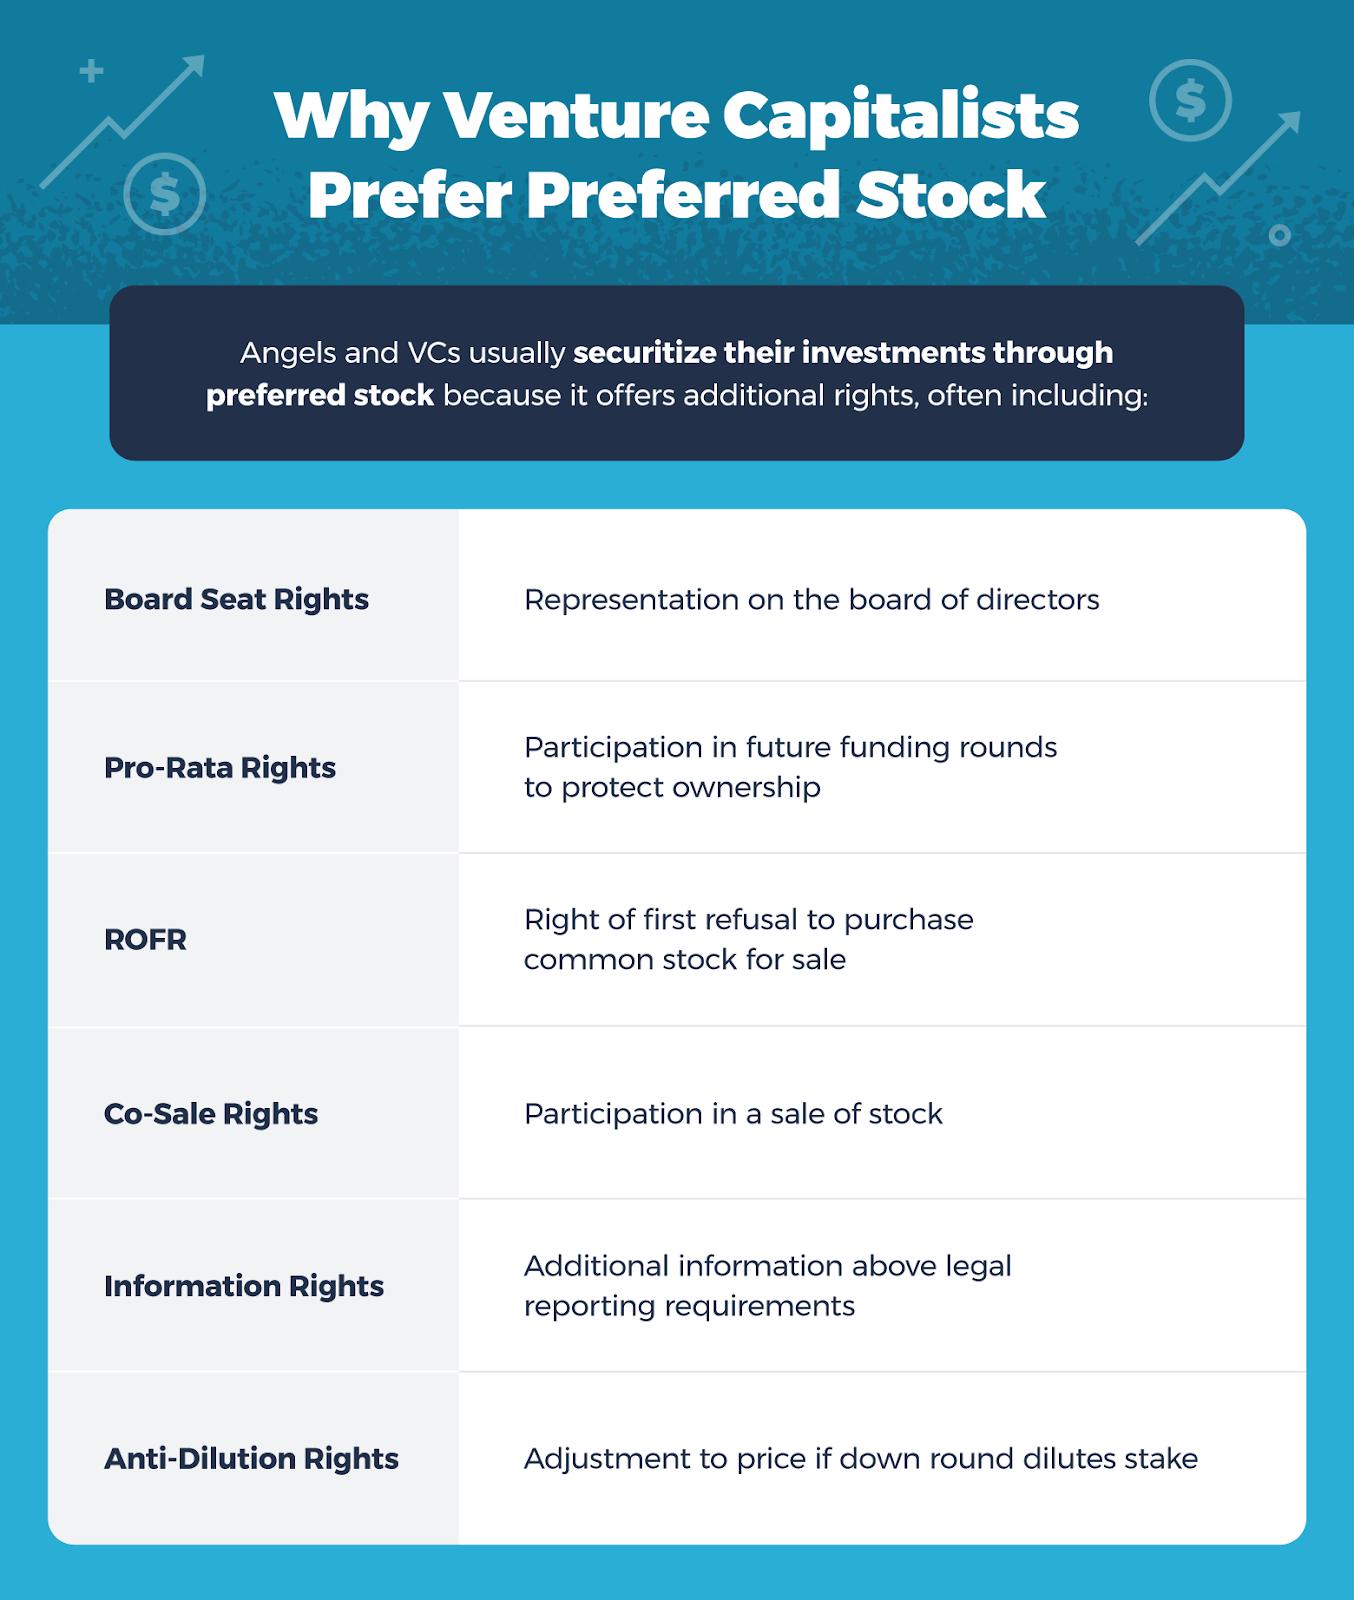 why venture capitalists prefer preferred stock with board seats, pro-rata rights, ROFR, Co-Sale Rights, Information Rights, and Anti-Dilution Rights.